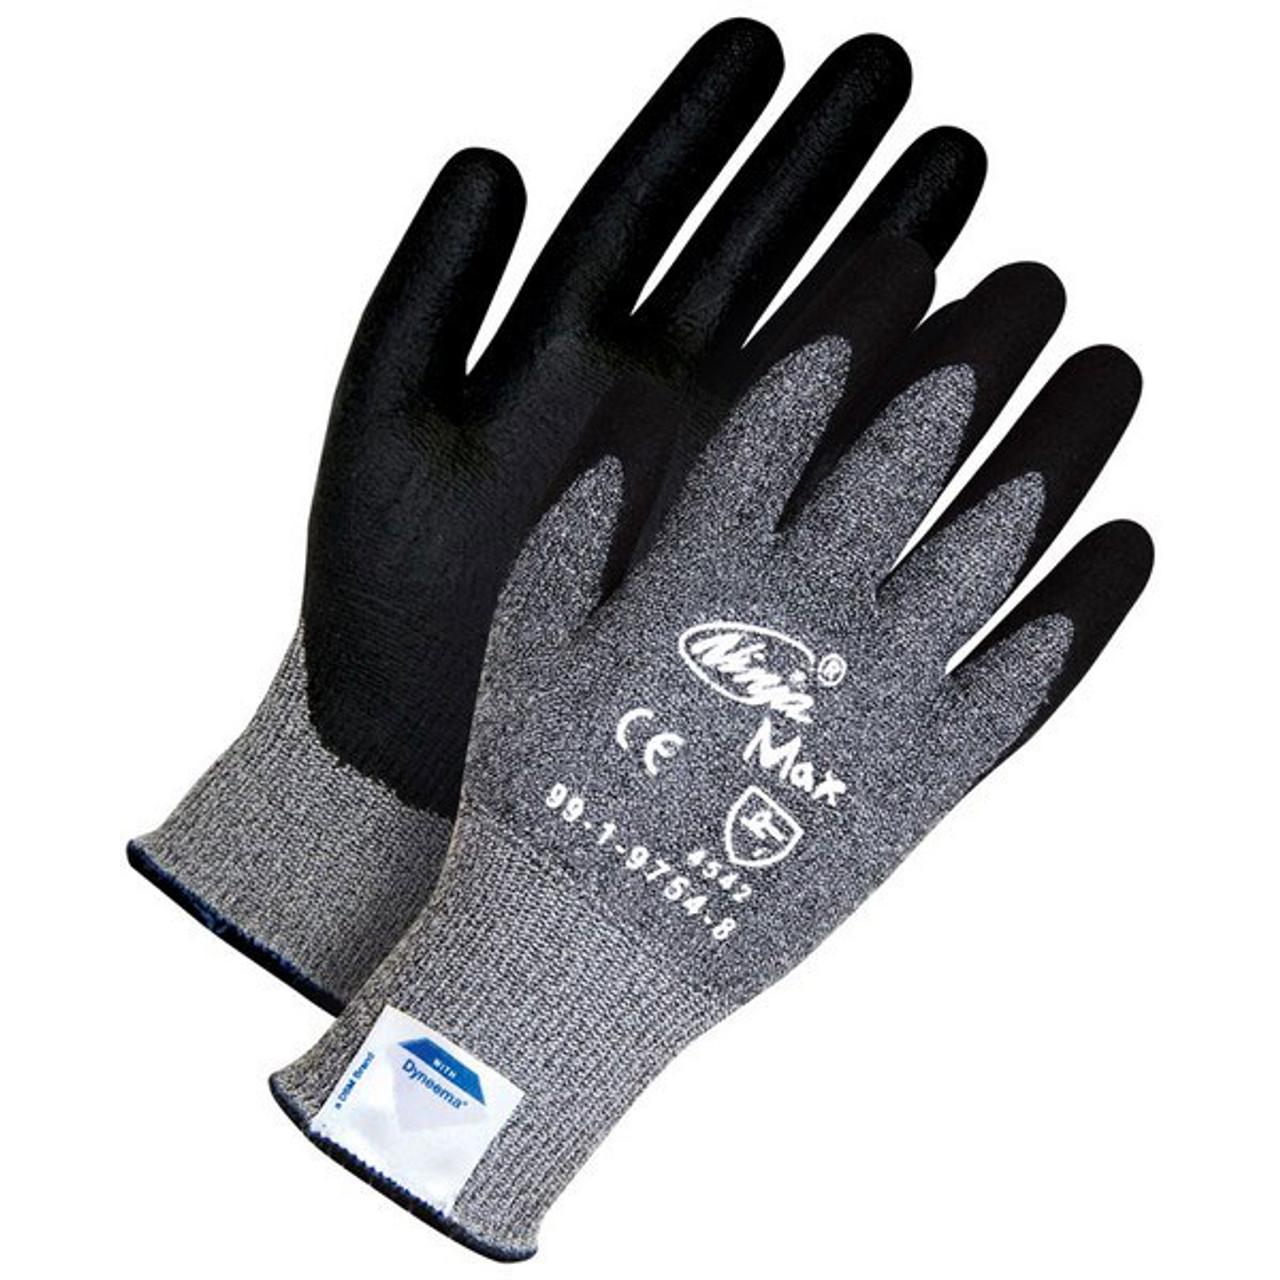 Ninja Max Coated Cut-Resistant Gloves | CE, ANSI | BDG Gloves